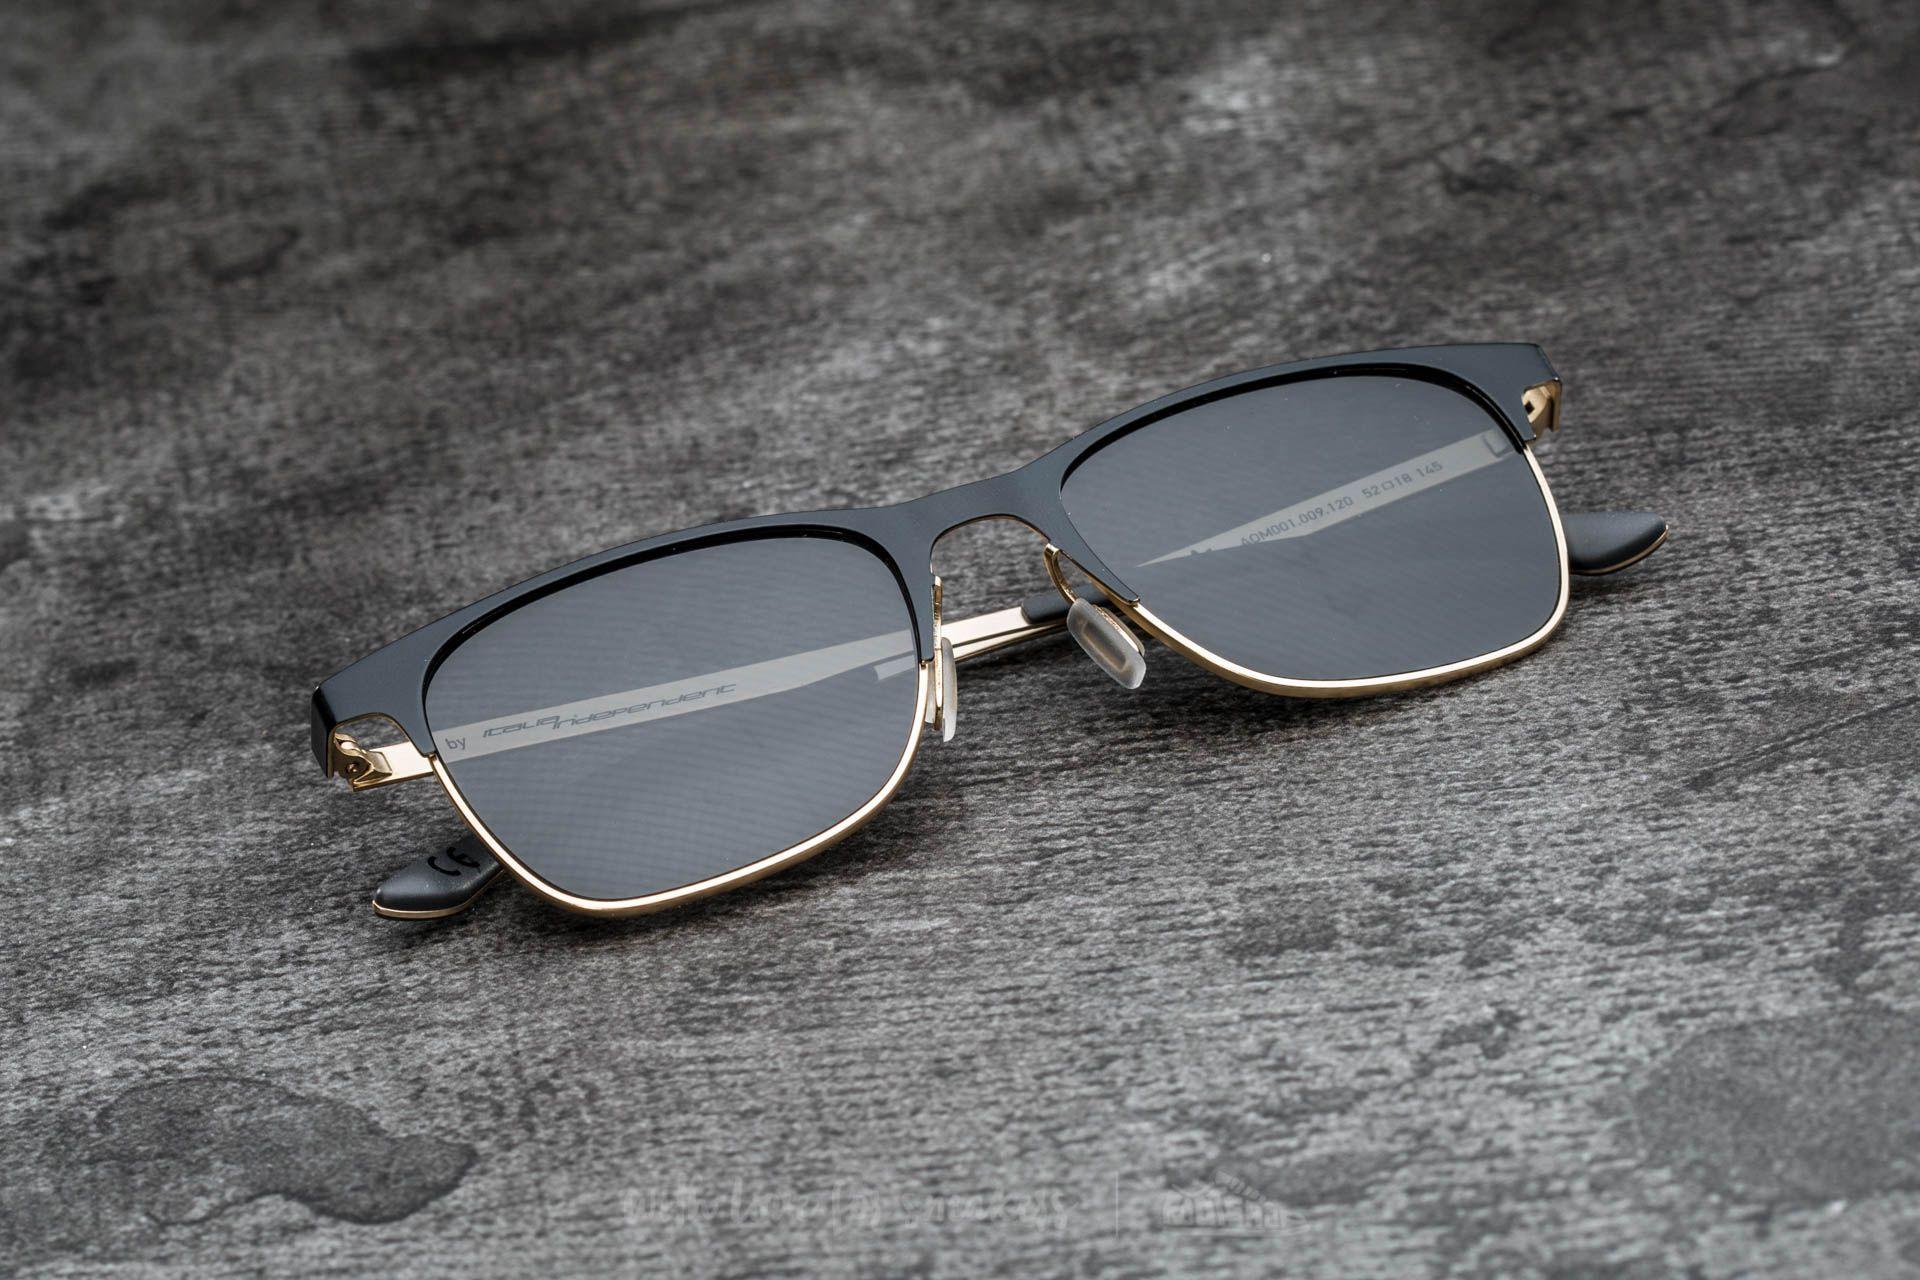 adidas x Italia Independent AOM001 Sunglasses Black/ Light Gold - 15083